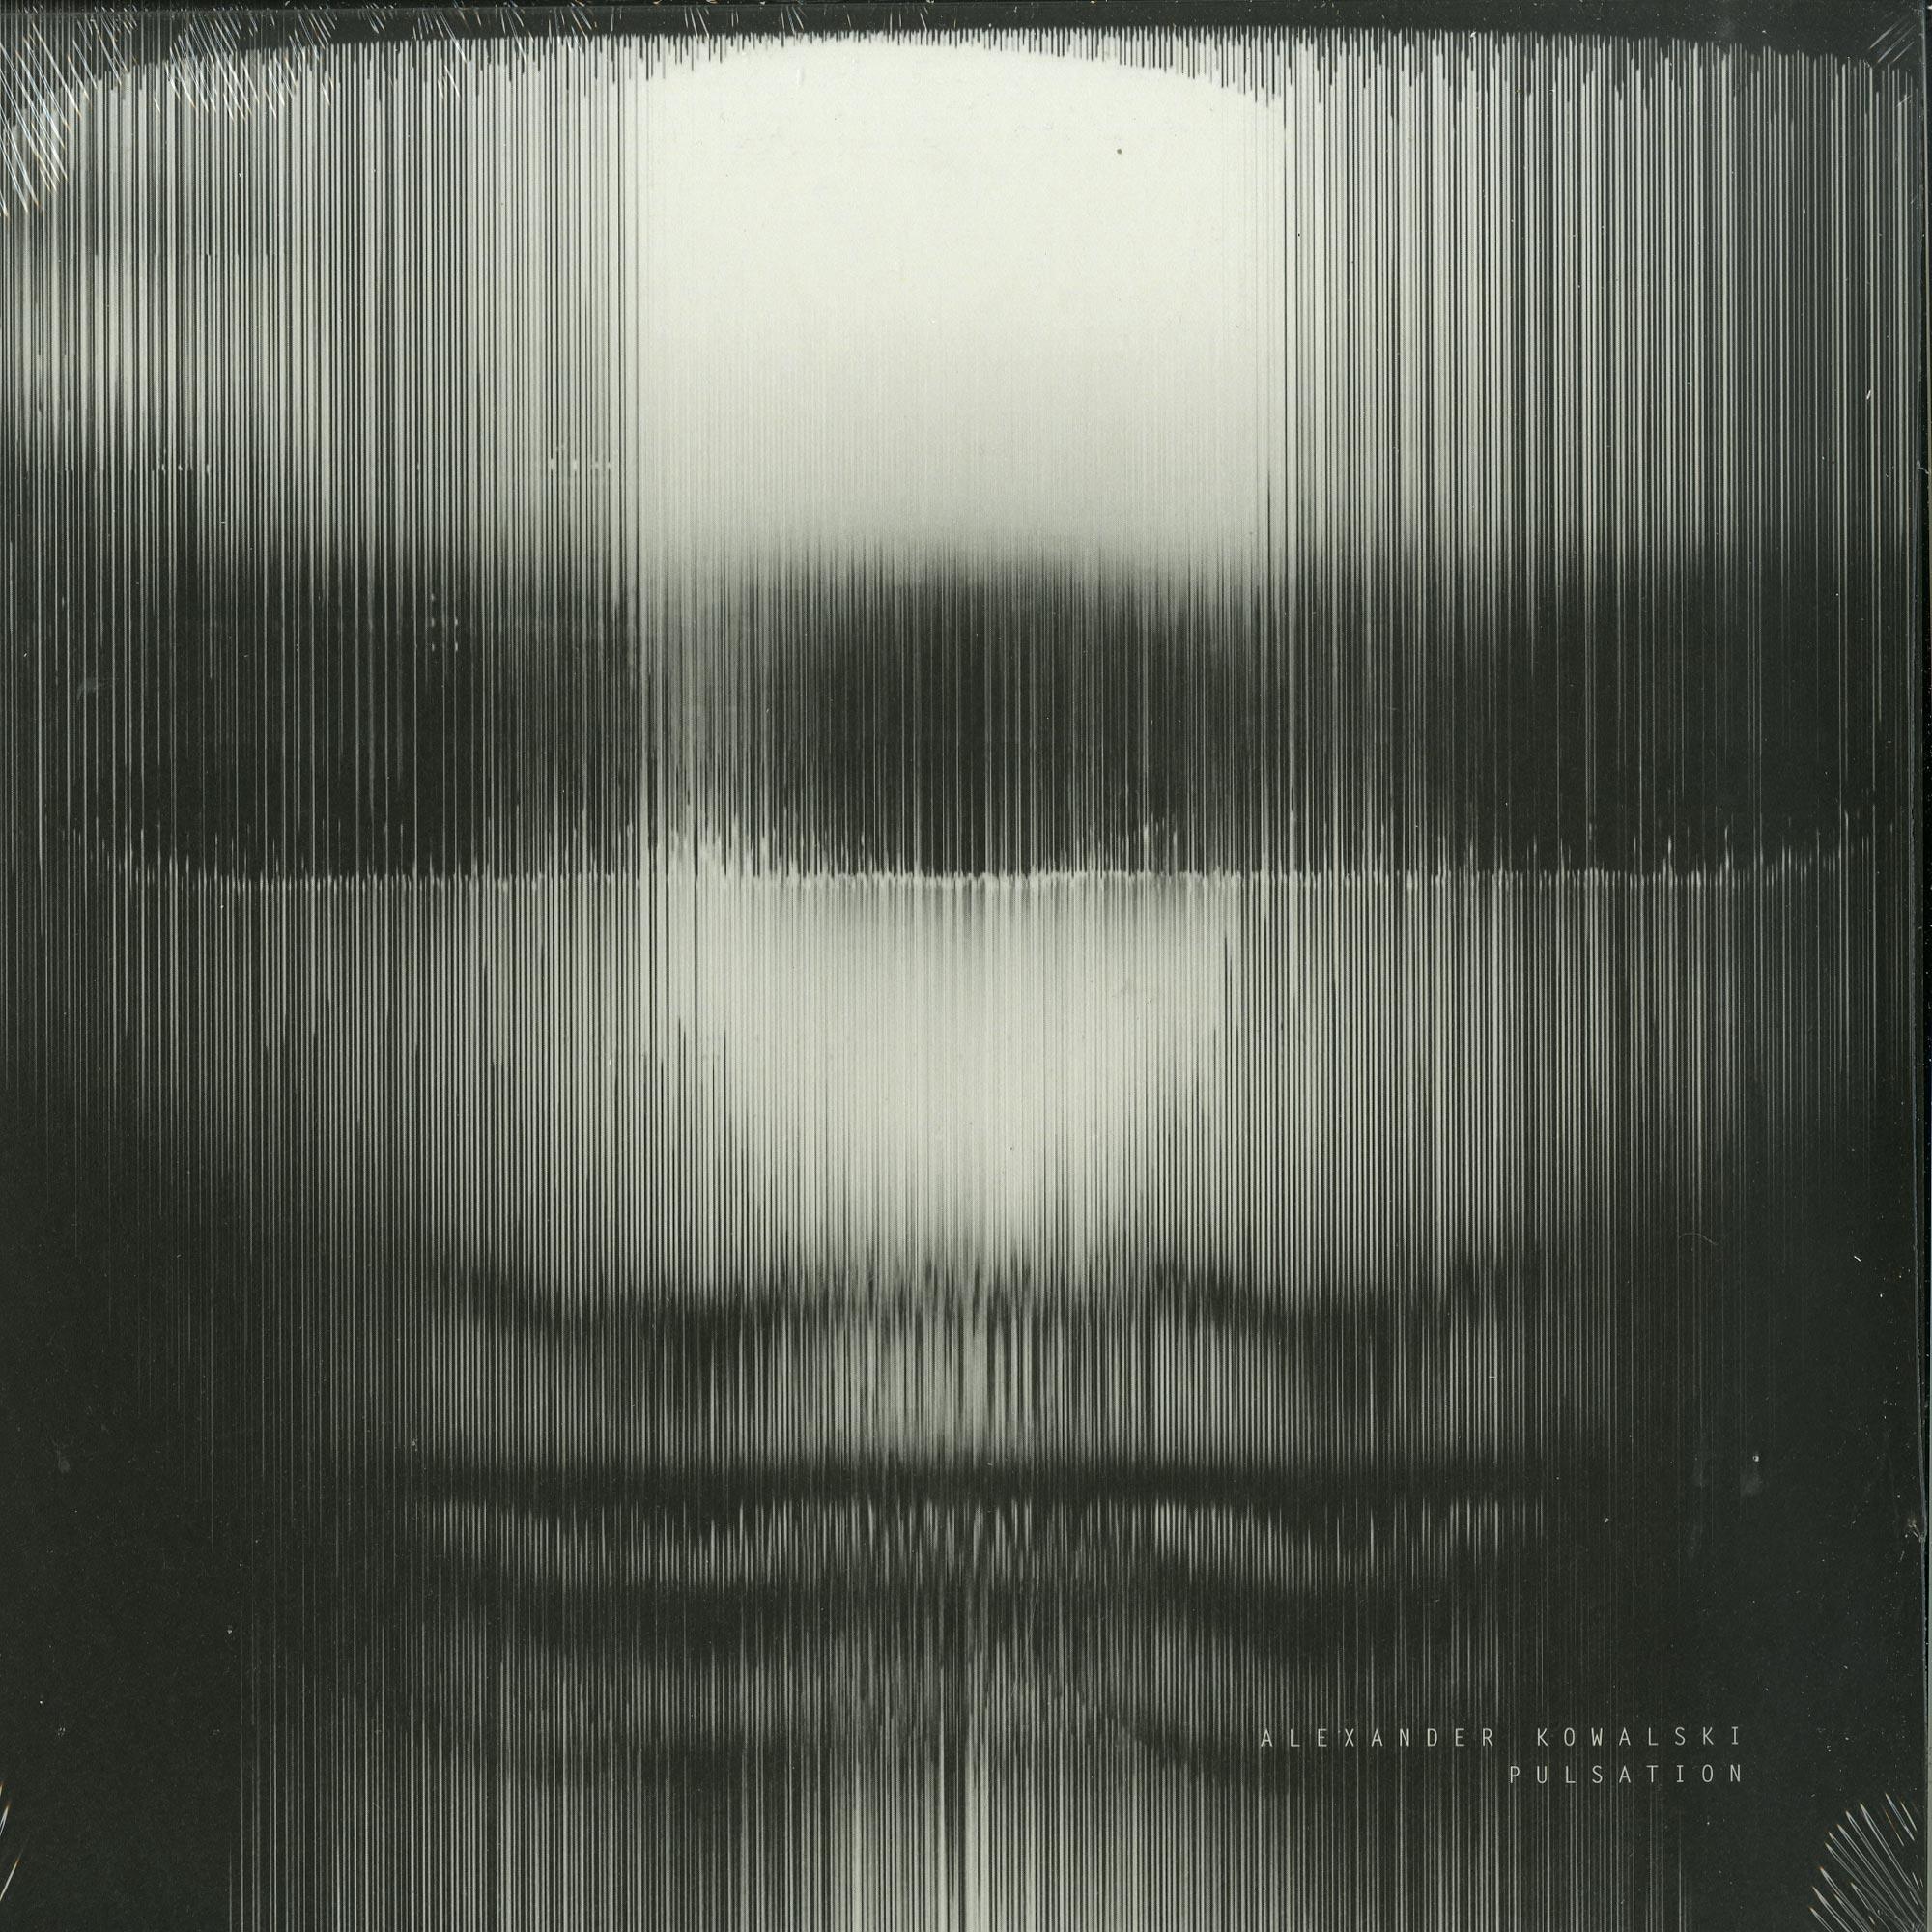 Alexander Kowalski - PULSATION